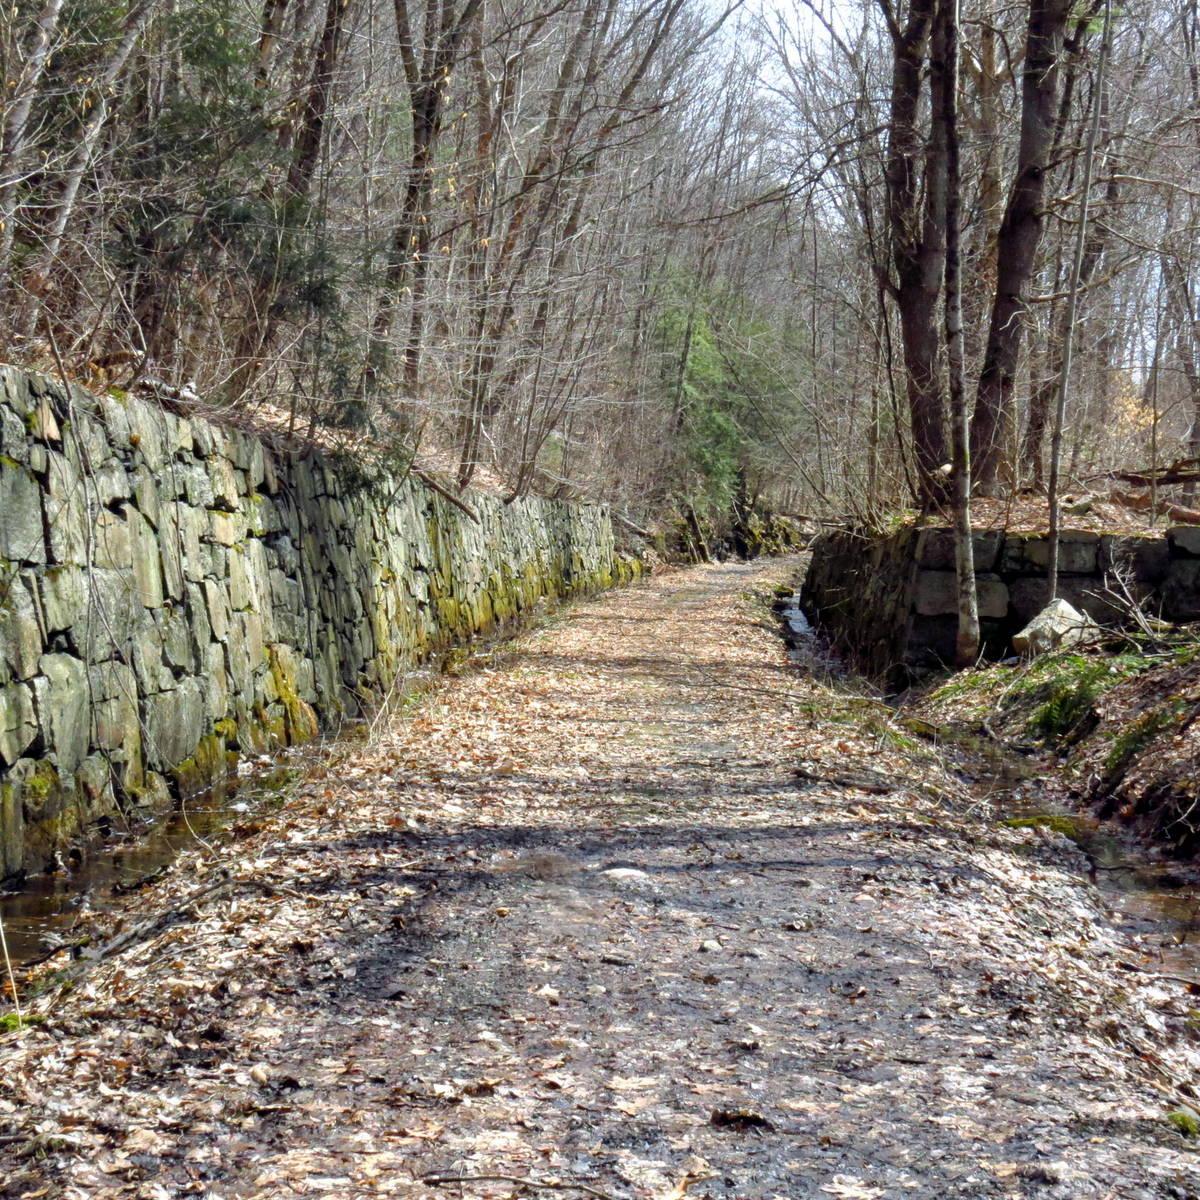 4. Trail